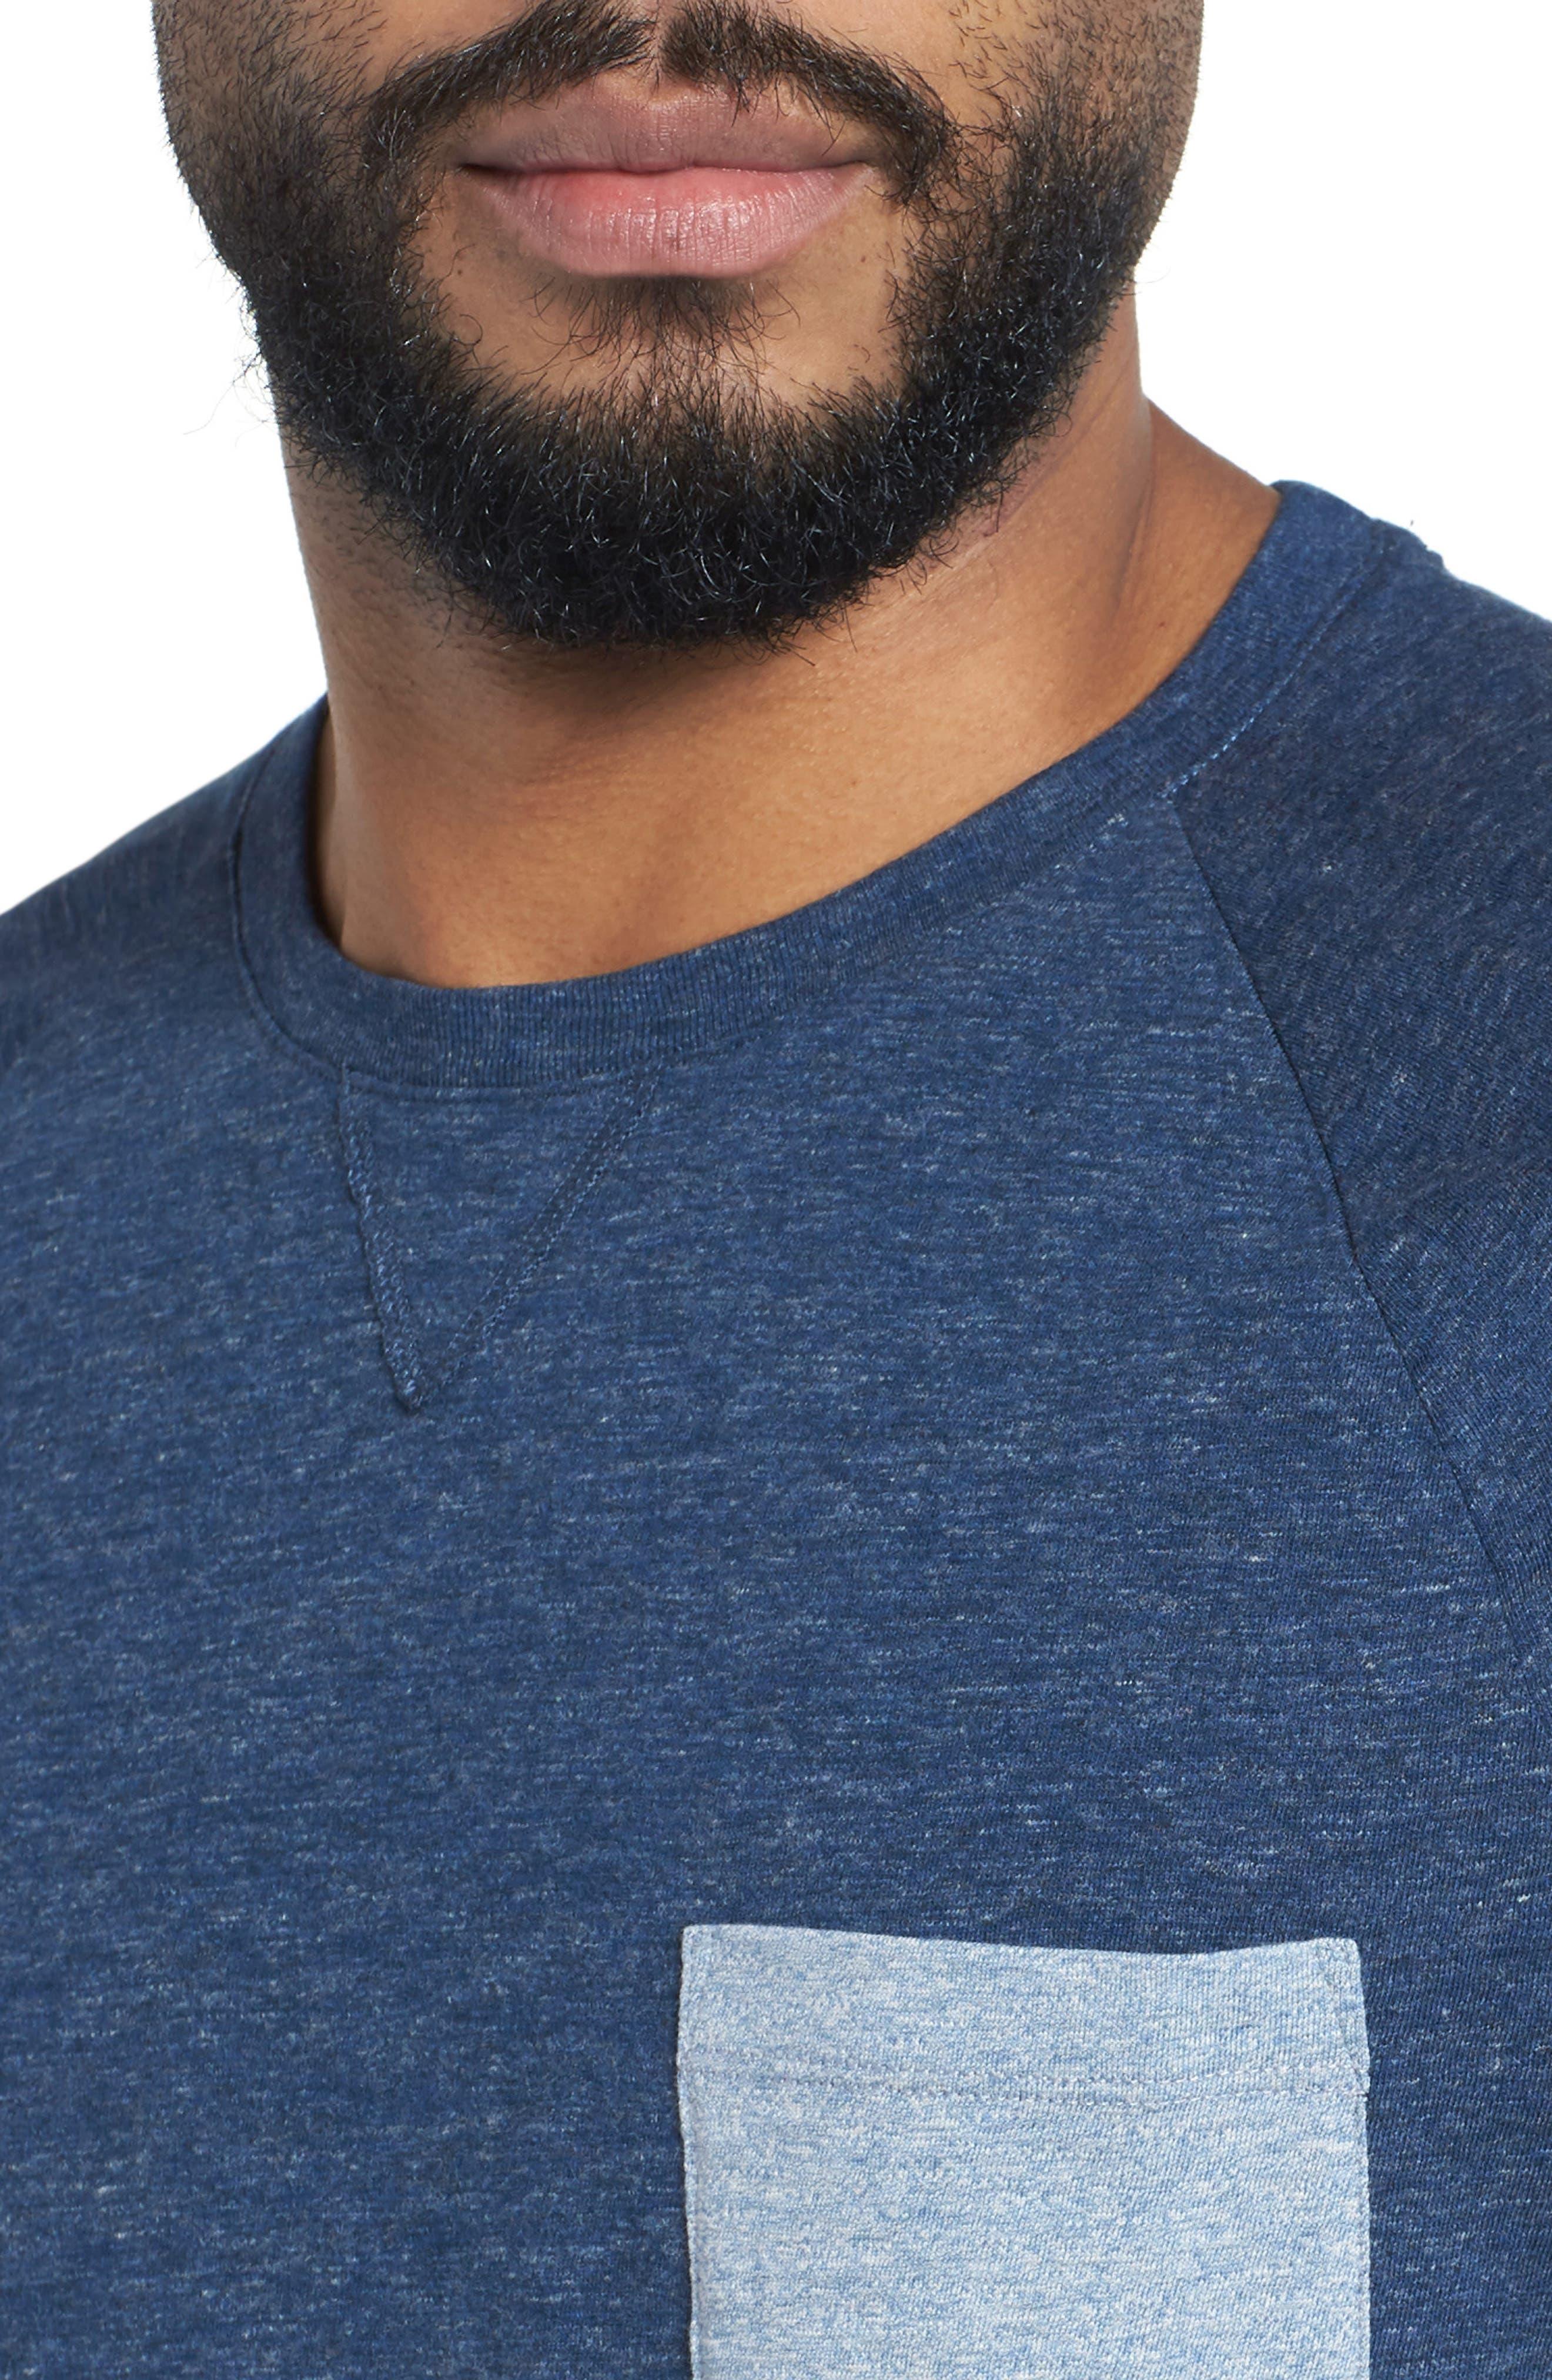 Tessler Slim Fit Pocket T-Shirt,                             Alternate thumbnail 4, color,                             Blue